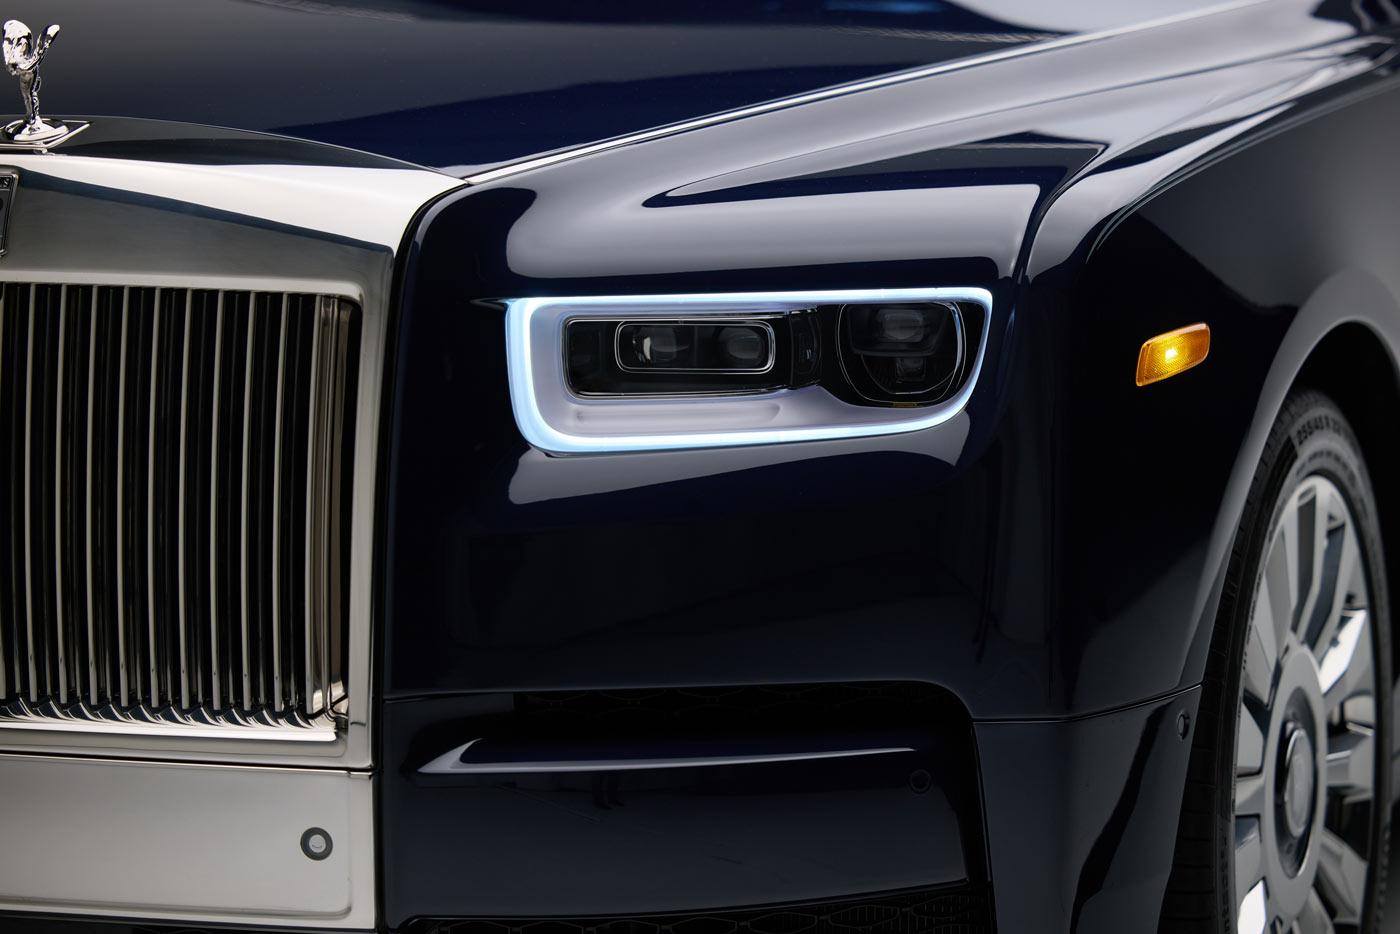 2021 Rolls-Royce Phantom Extended - The JBS Collection